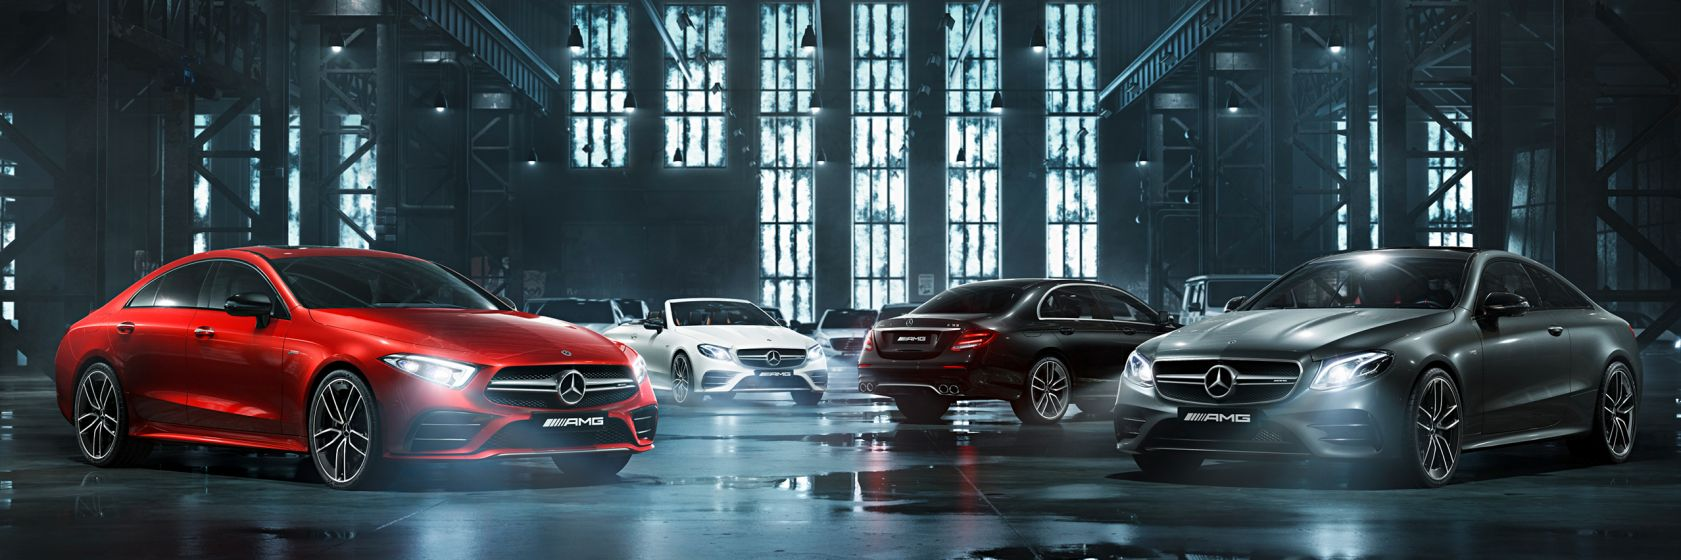 Mercedes Benz Car Price List In Malaysia Mercedes Benz Malaysia